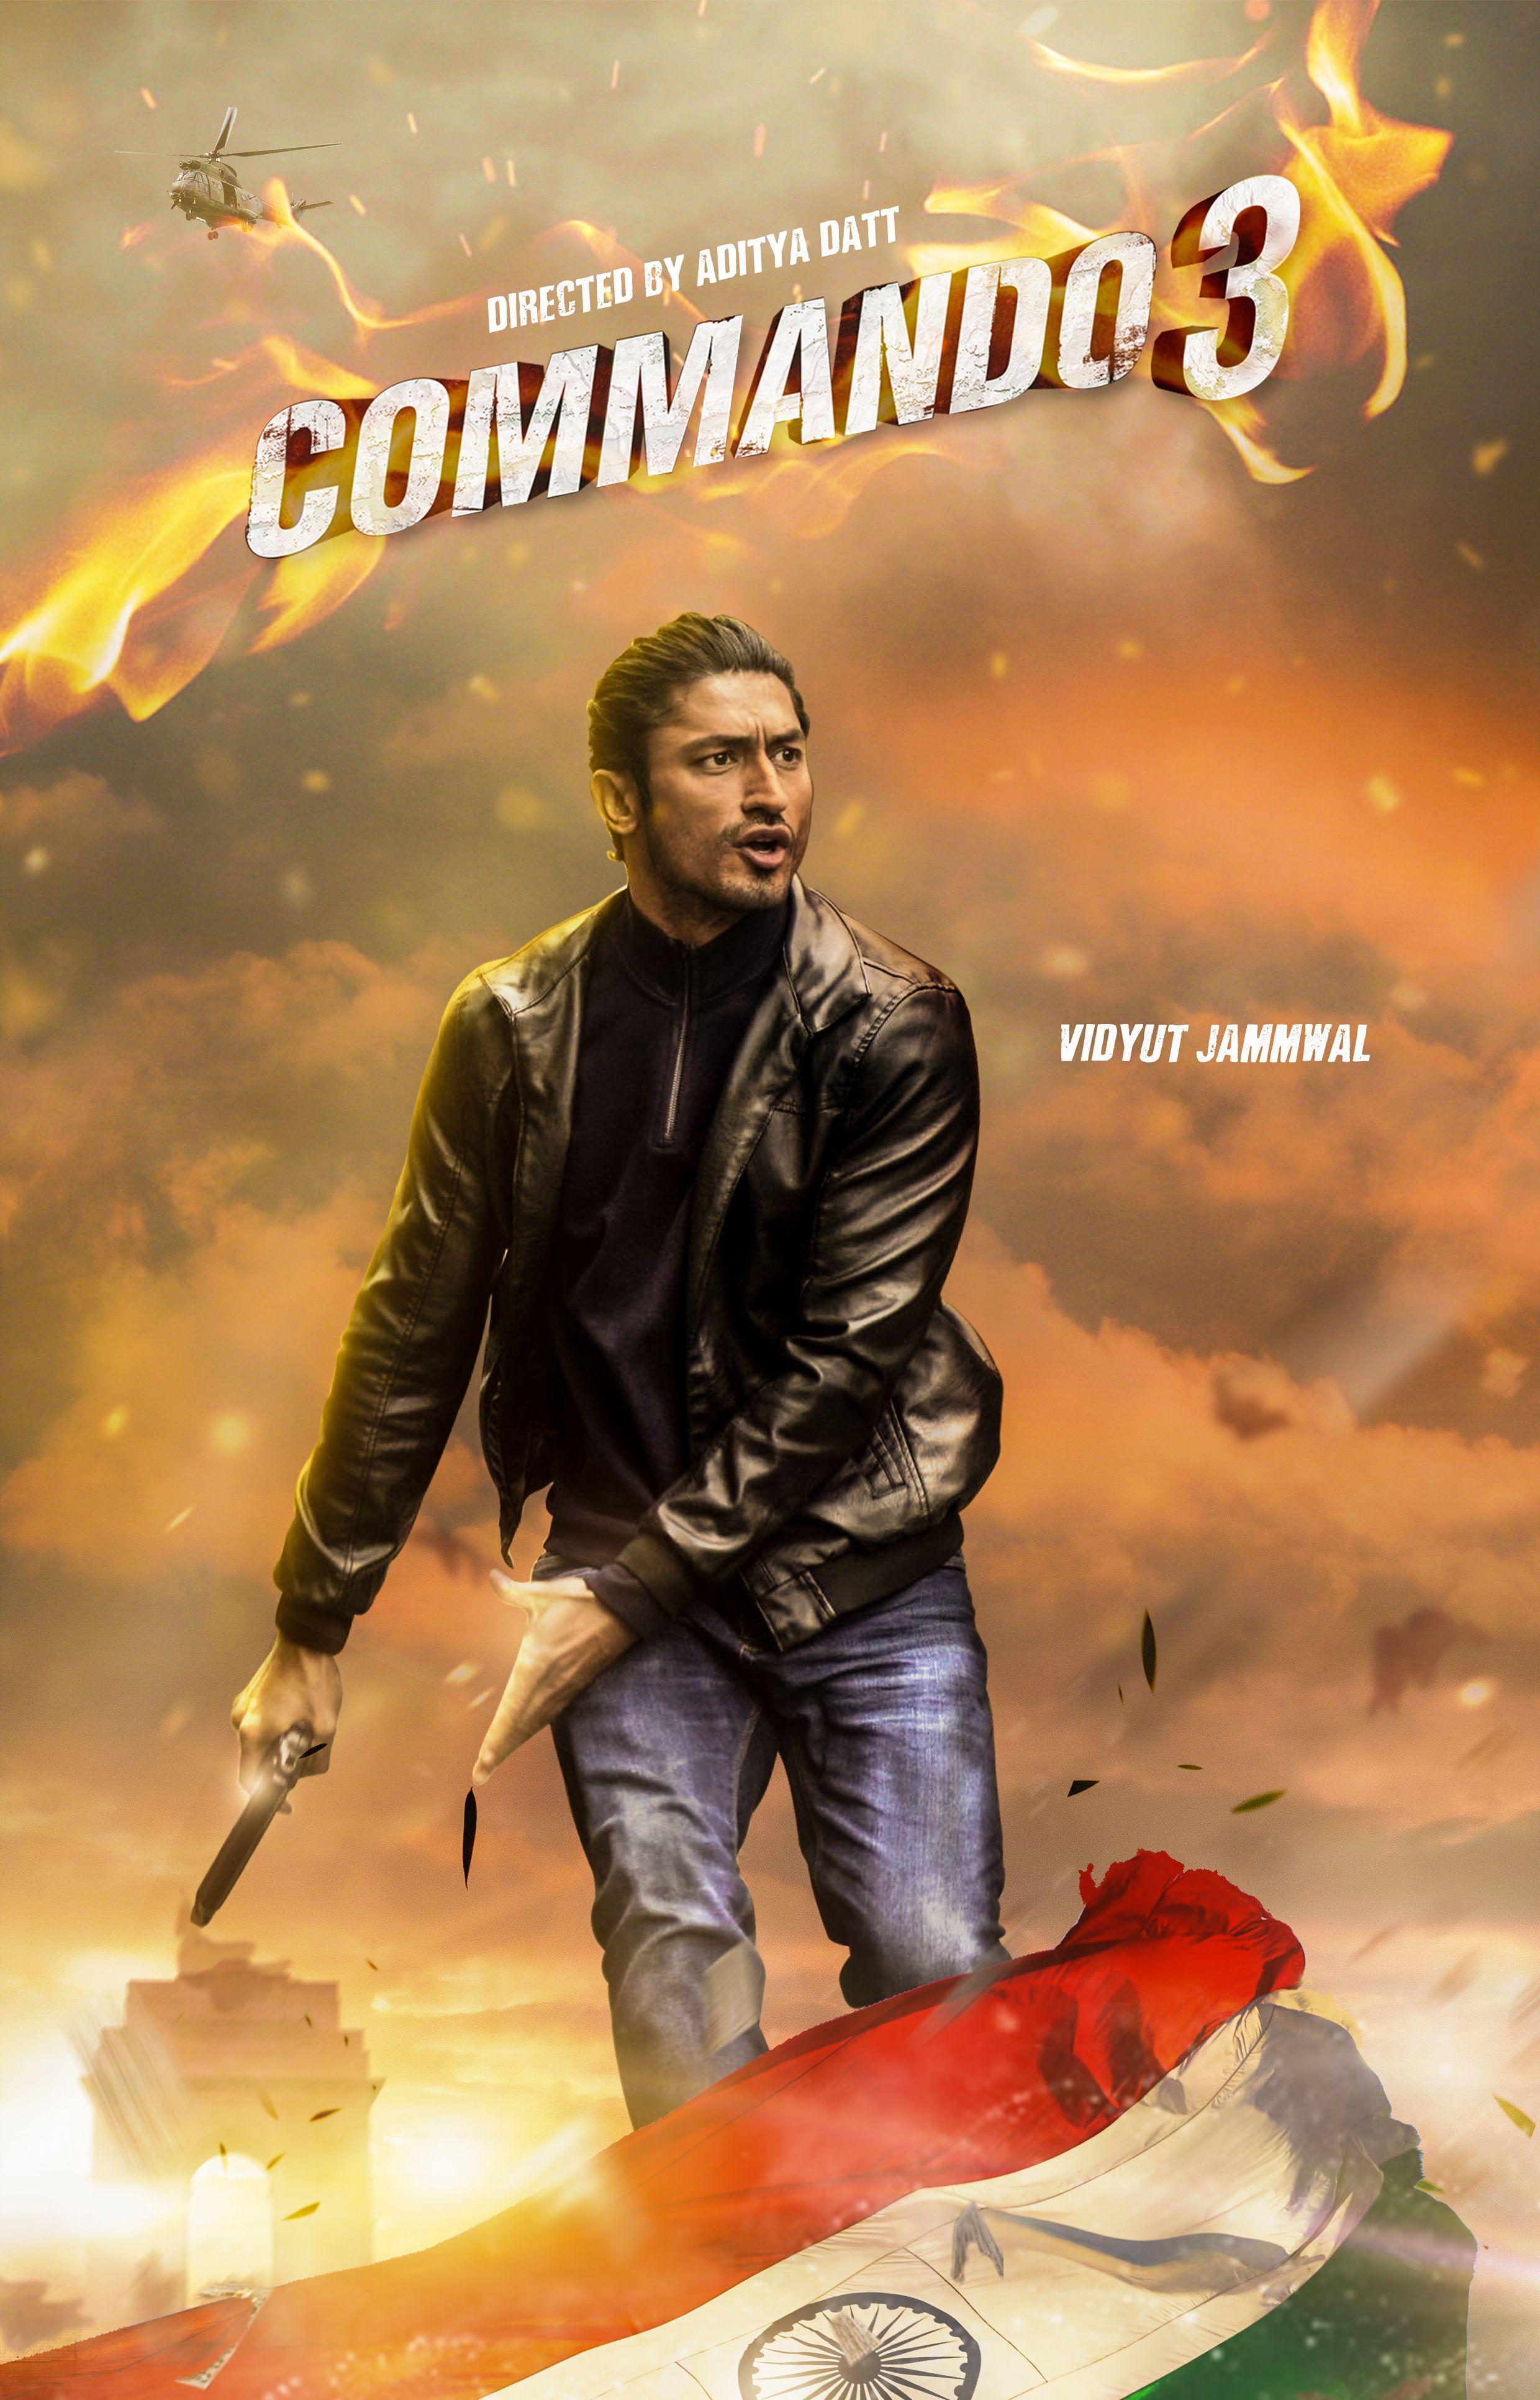 Commando3 Movie Poster Movies Online Free Film Hindi Movies Online Free Full Movies